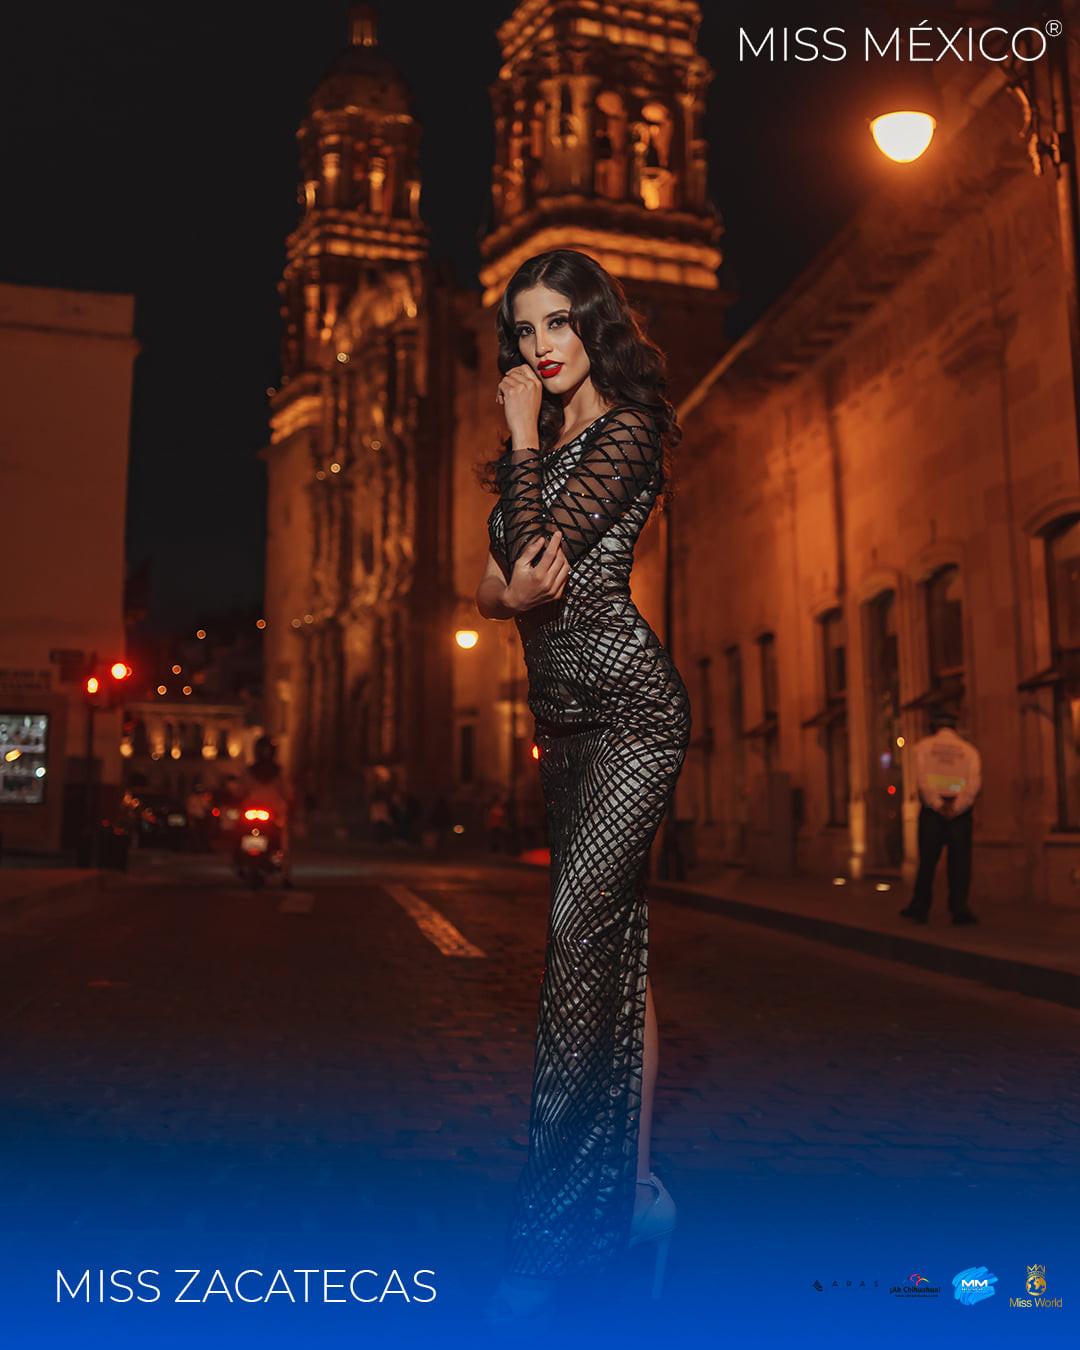 candidatas a miss mexico 2021, final: 3 july. - Página 13 Bm7QWu